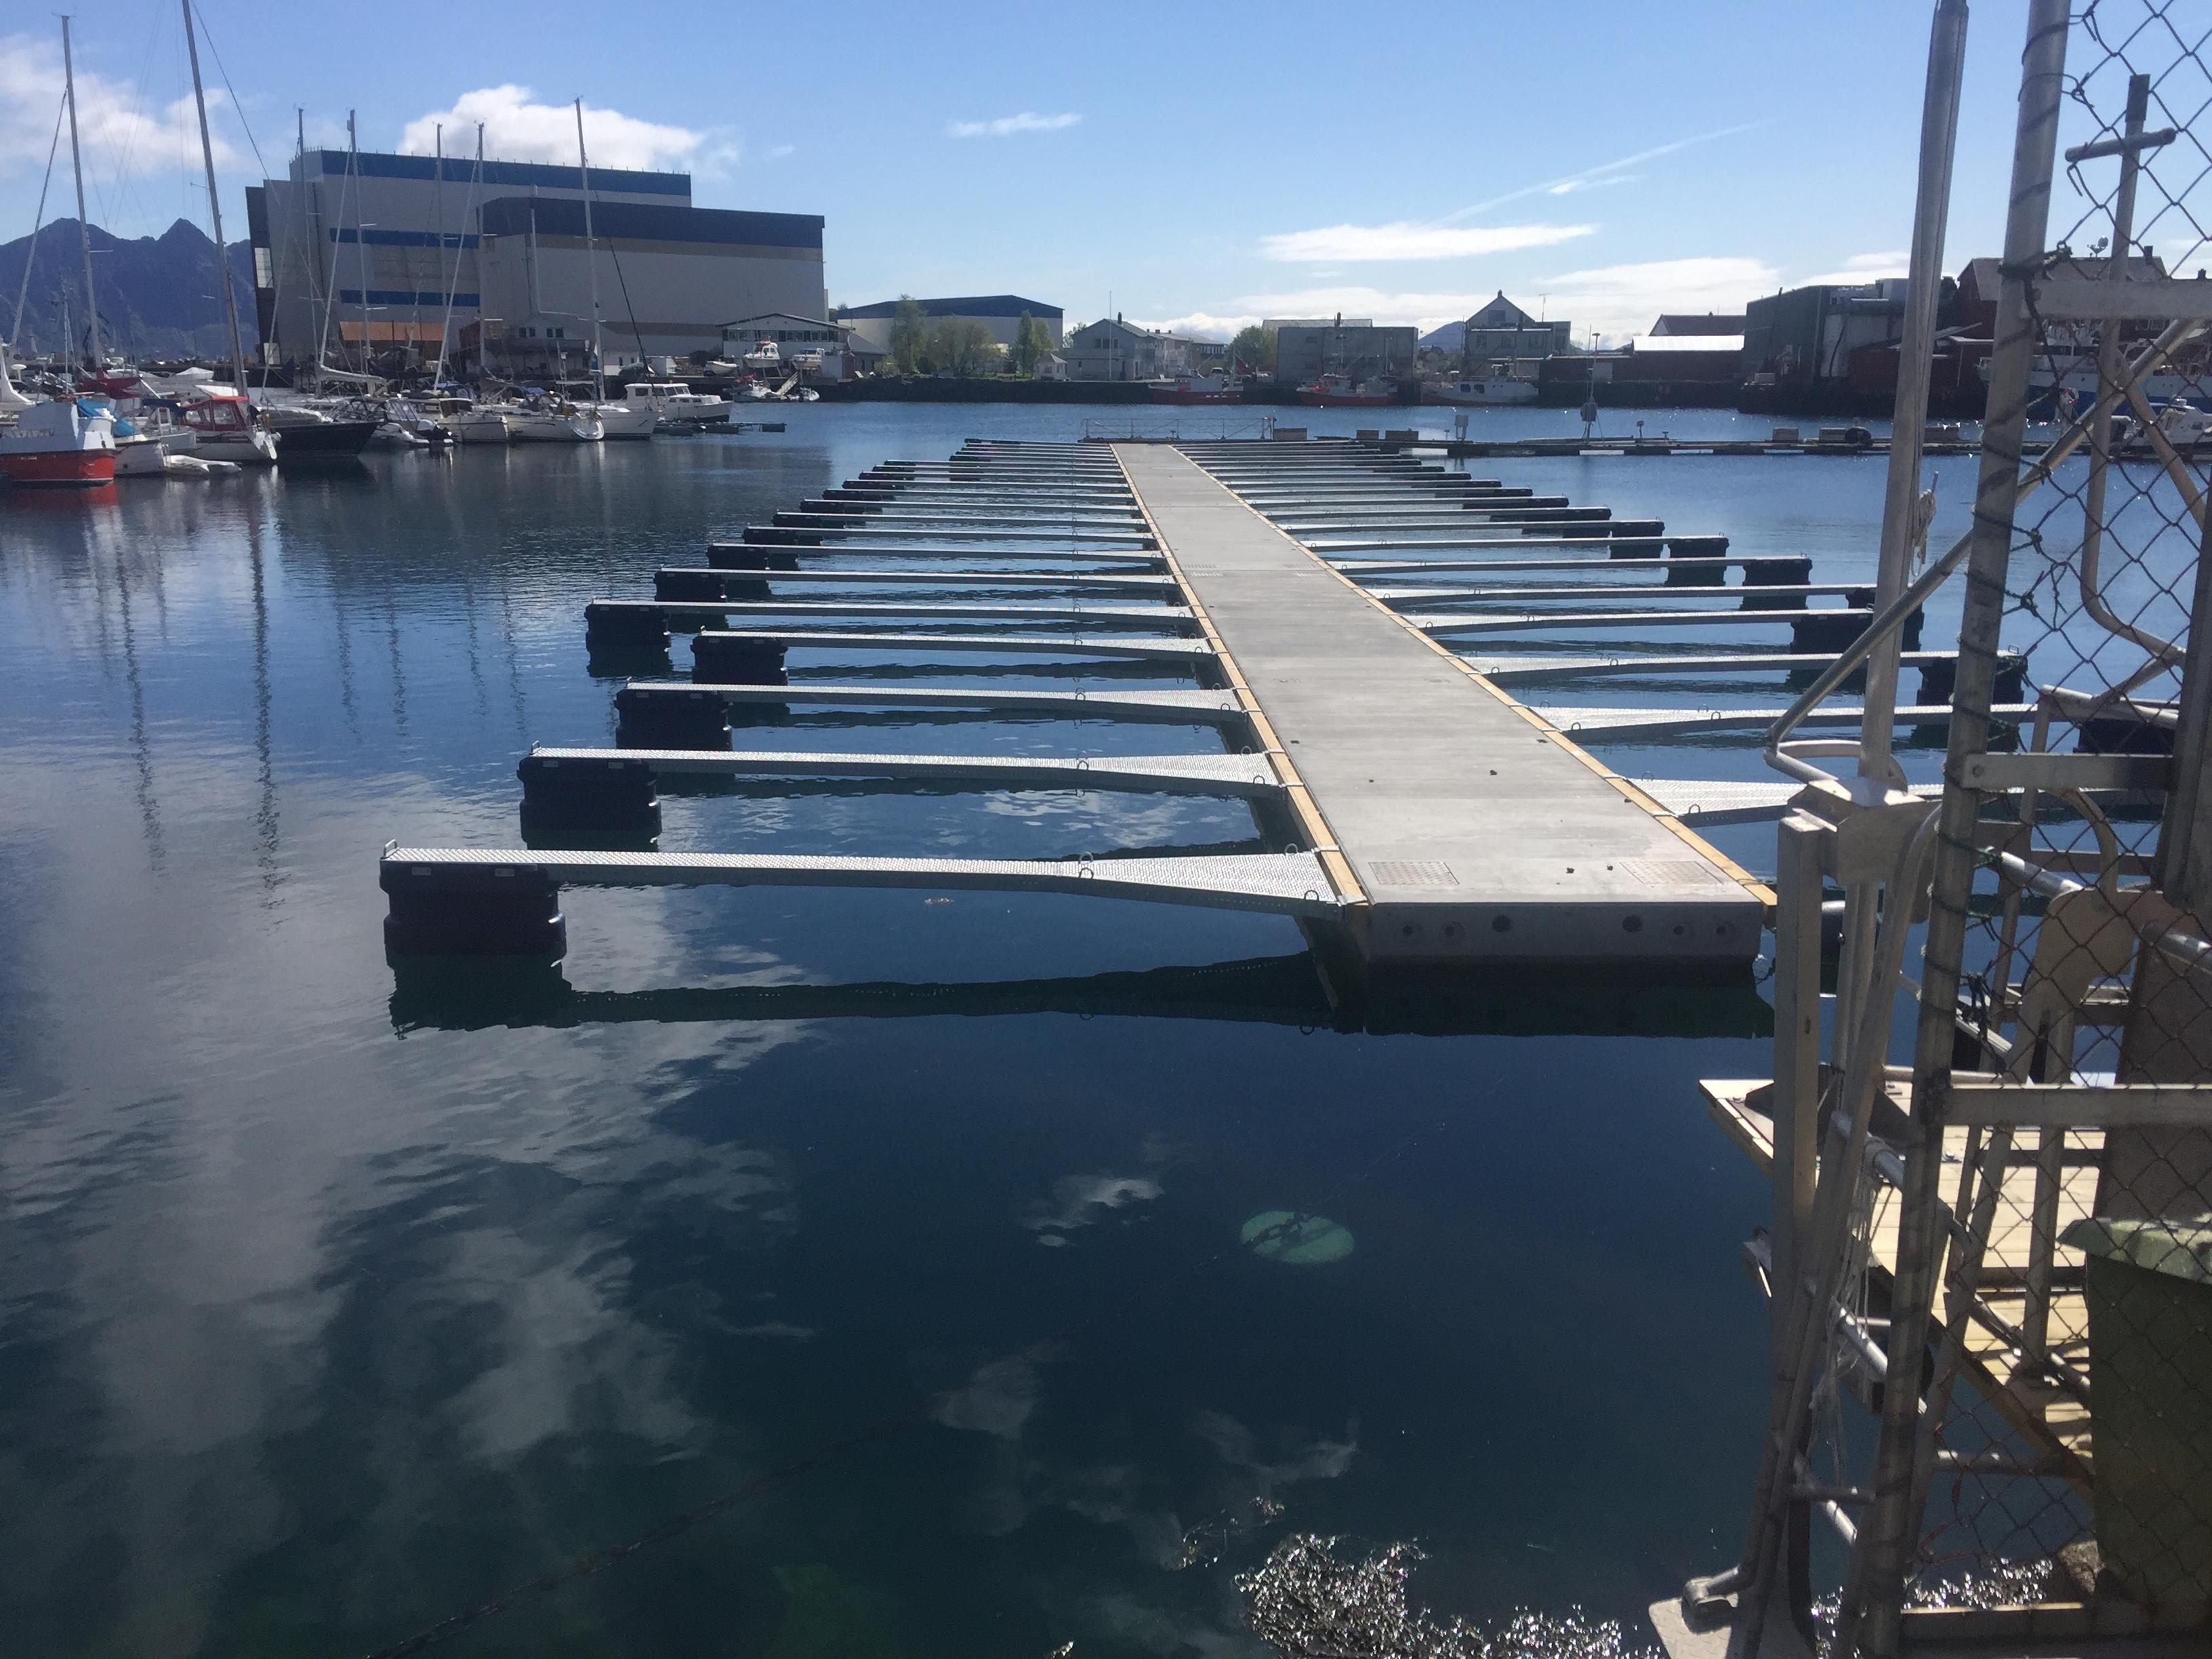 https://www.marinasolutions.no/uploads/Vågan-sjø-og-fiske-Foto-Otto-Aam-31.05.2018.JPG